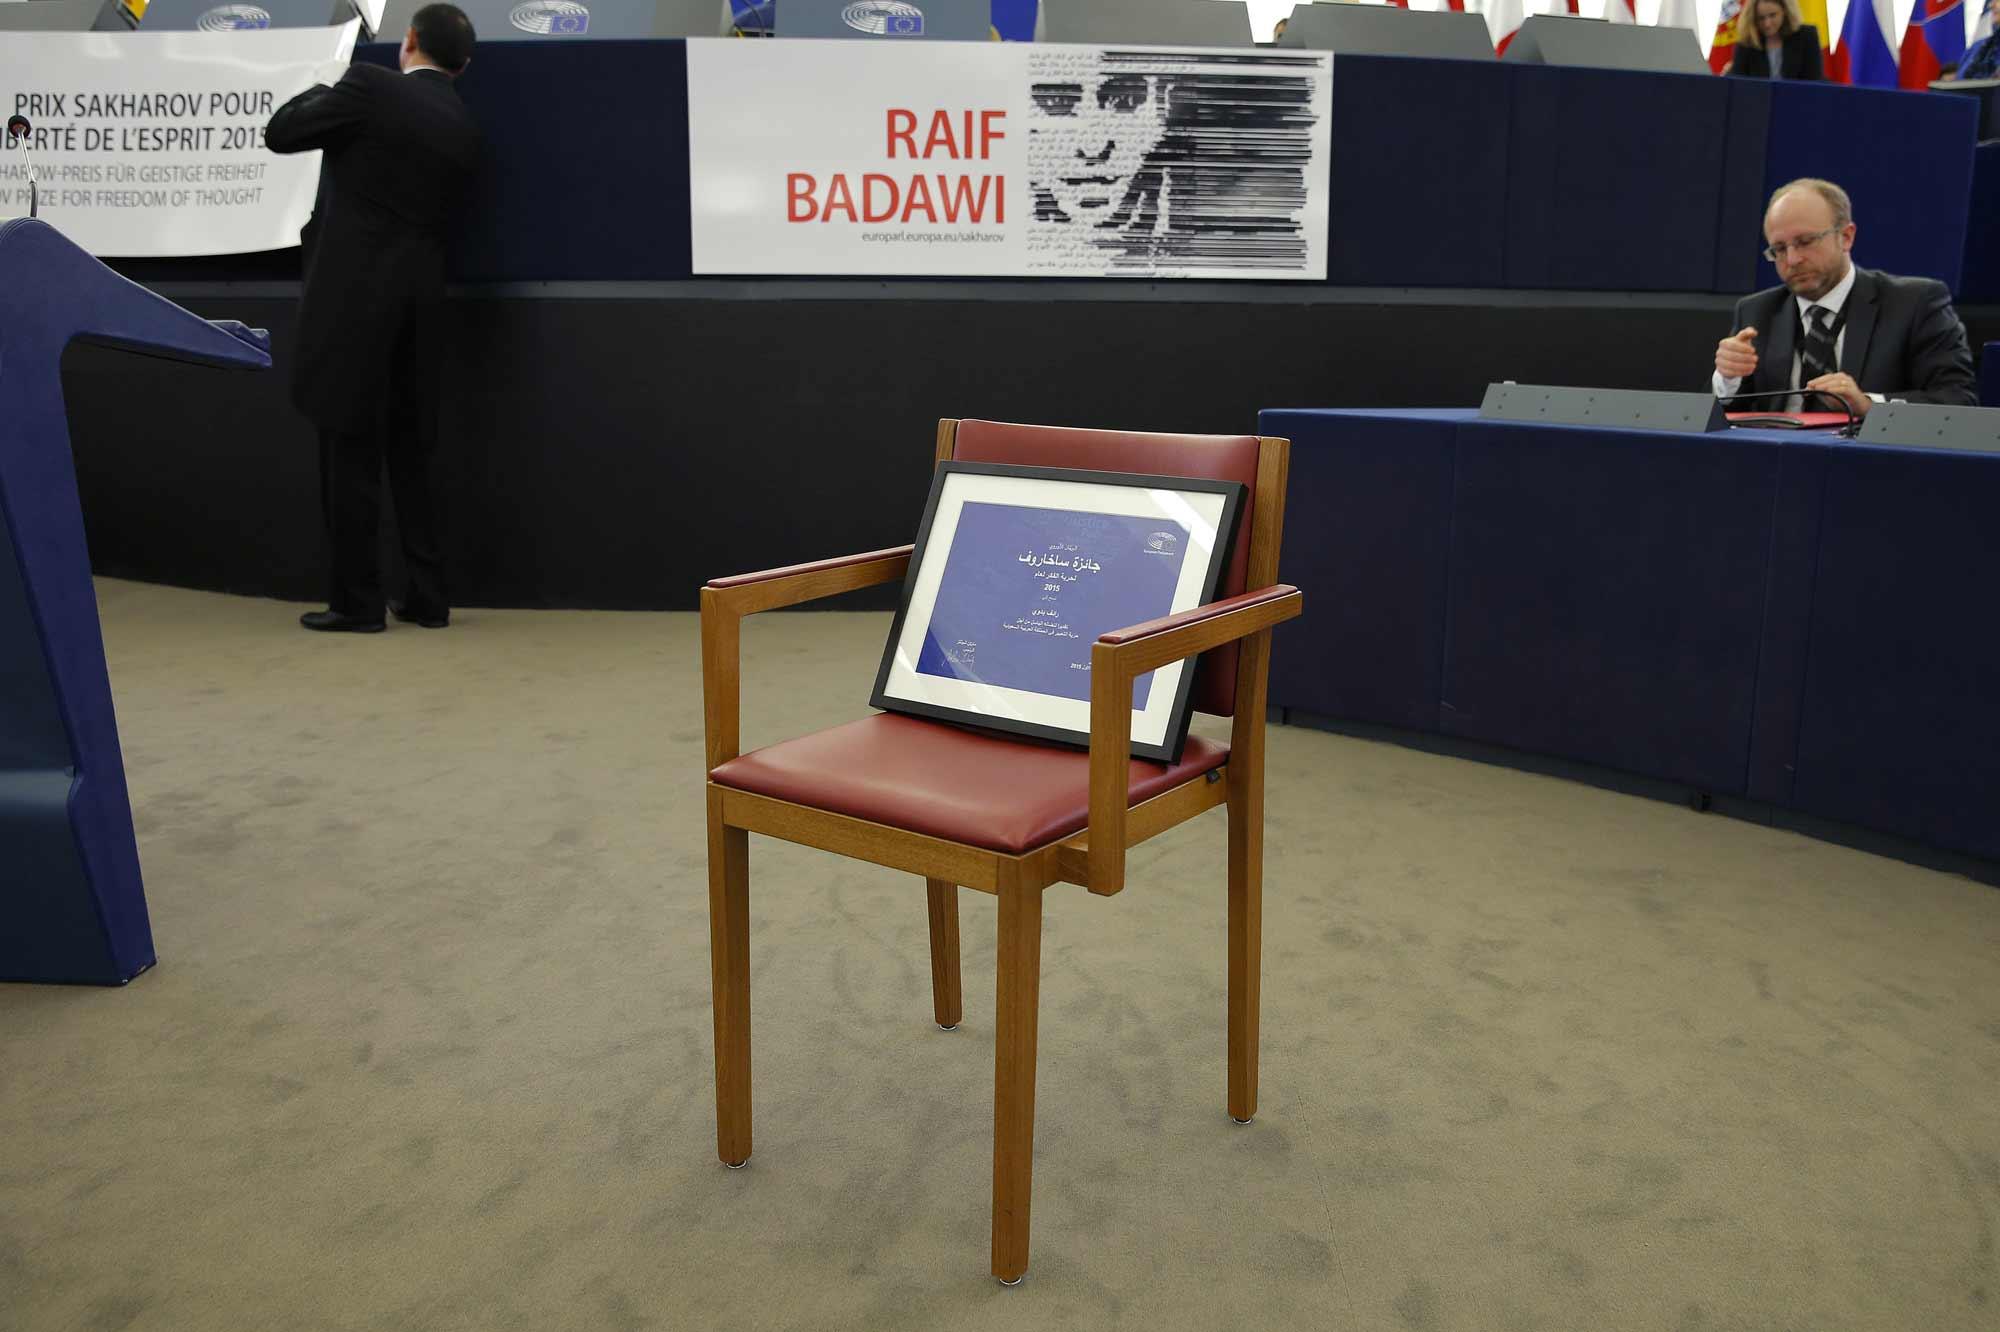 Raif-Badawi-recoit-le-prix-Sakharov-en-son-absence